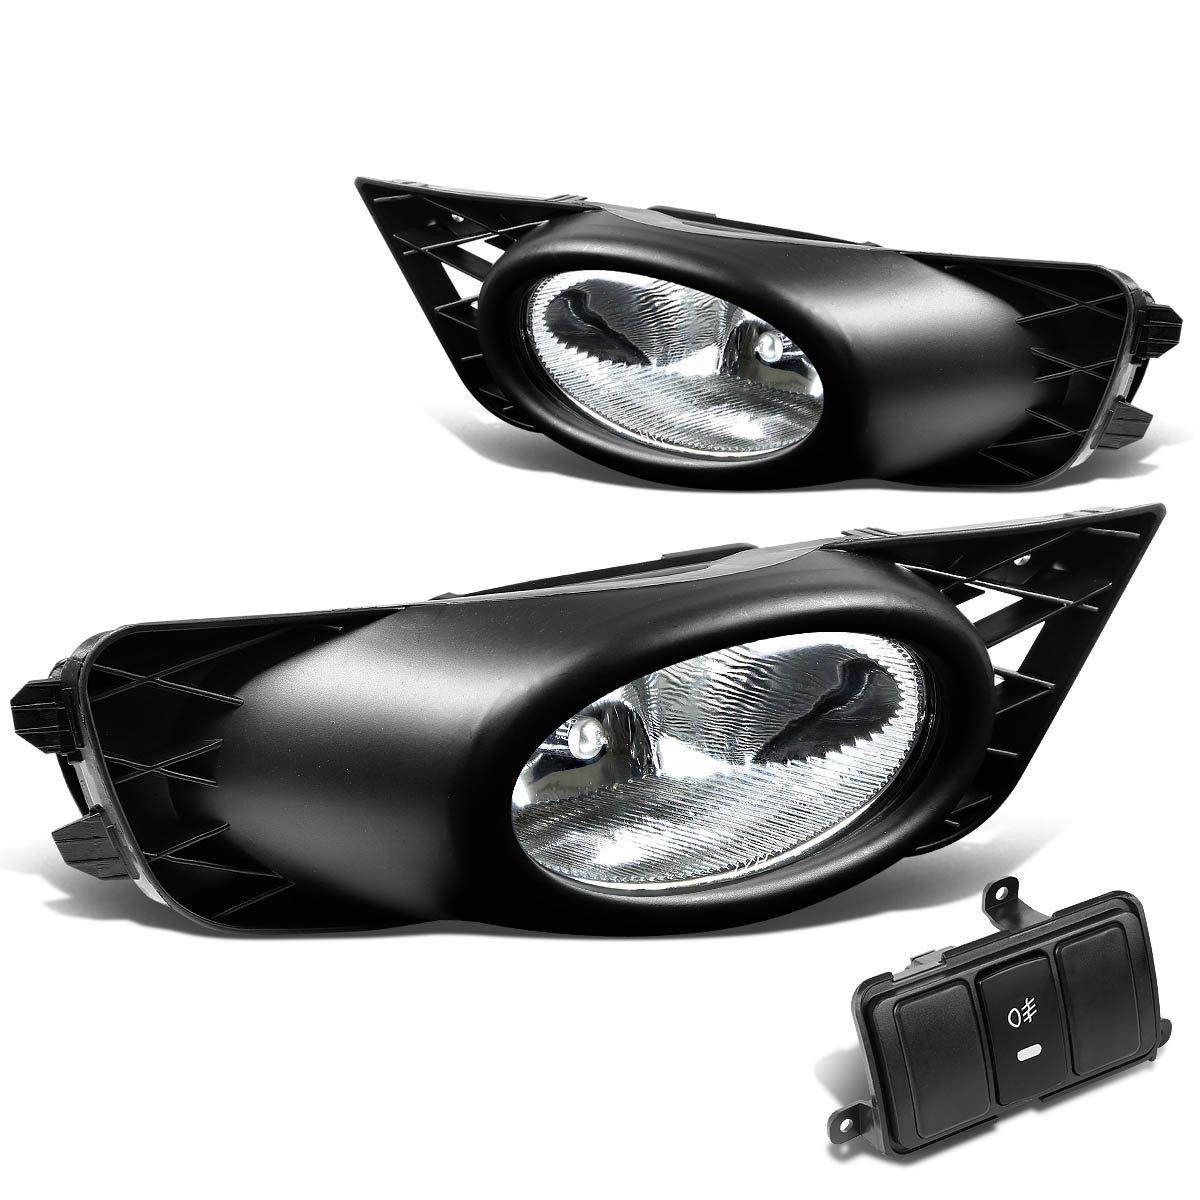 For Honda Civic Fa1 Sedan Pair Of Bumper Driving Fog Wiring A Switch Lights Kit Bezel Chrome Lens Automotive